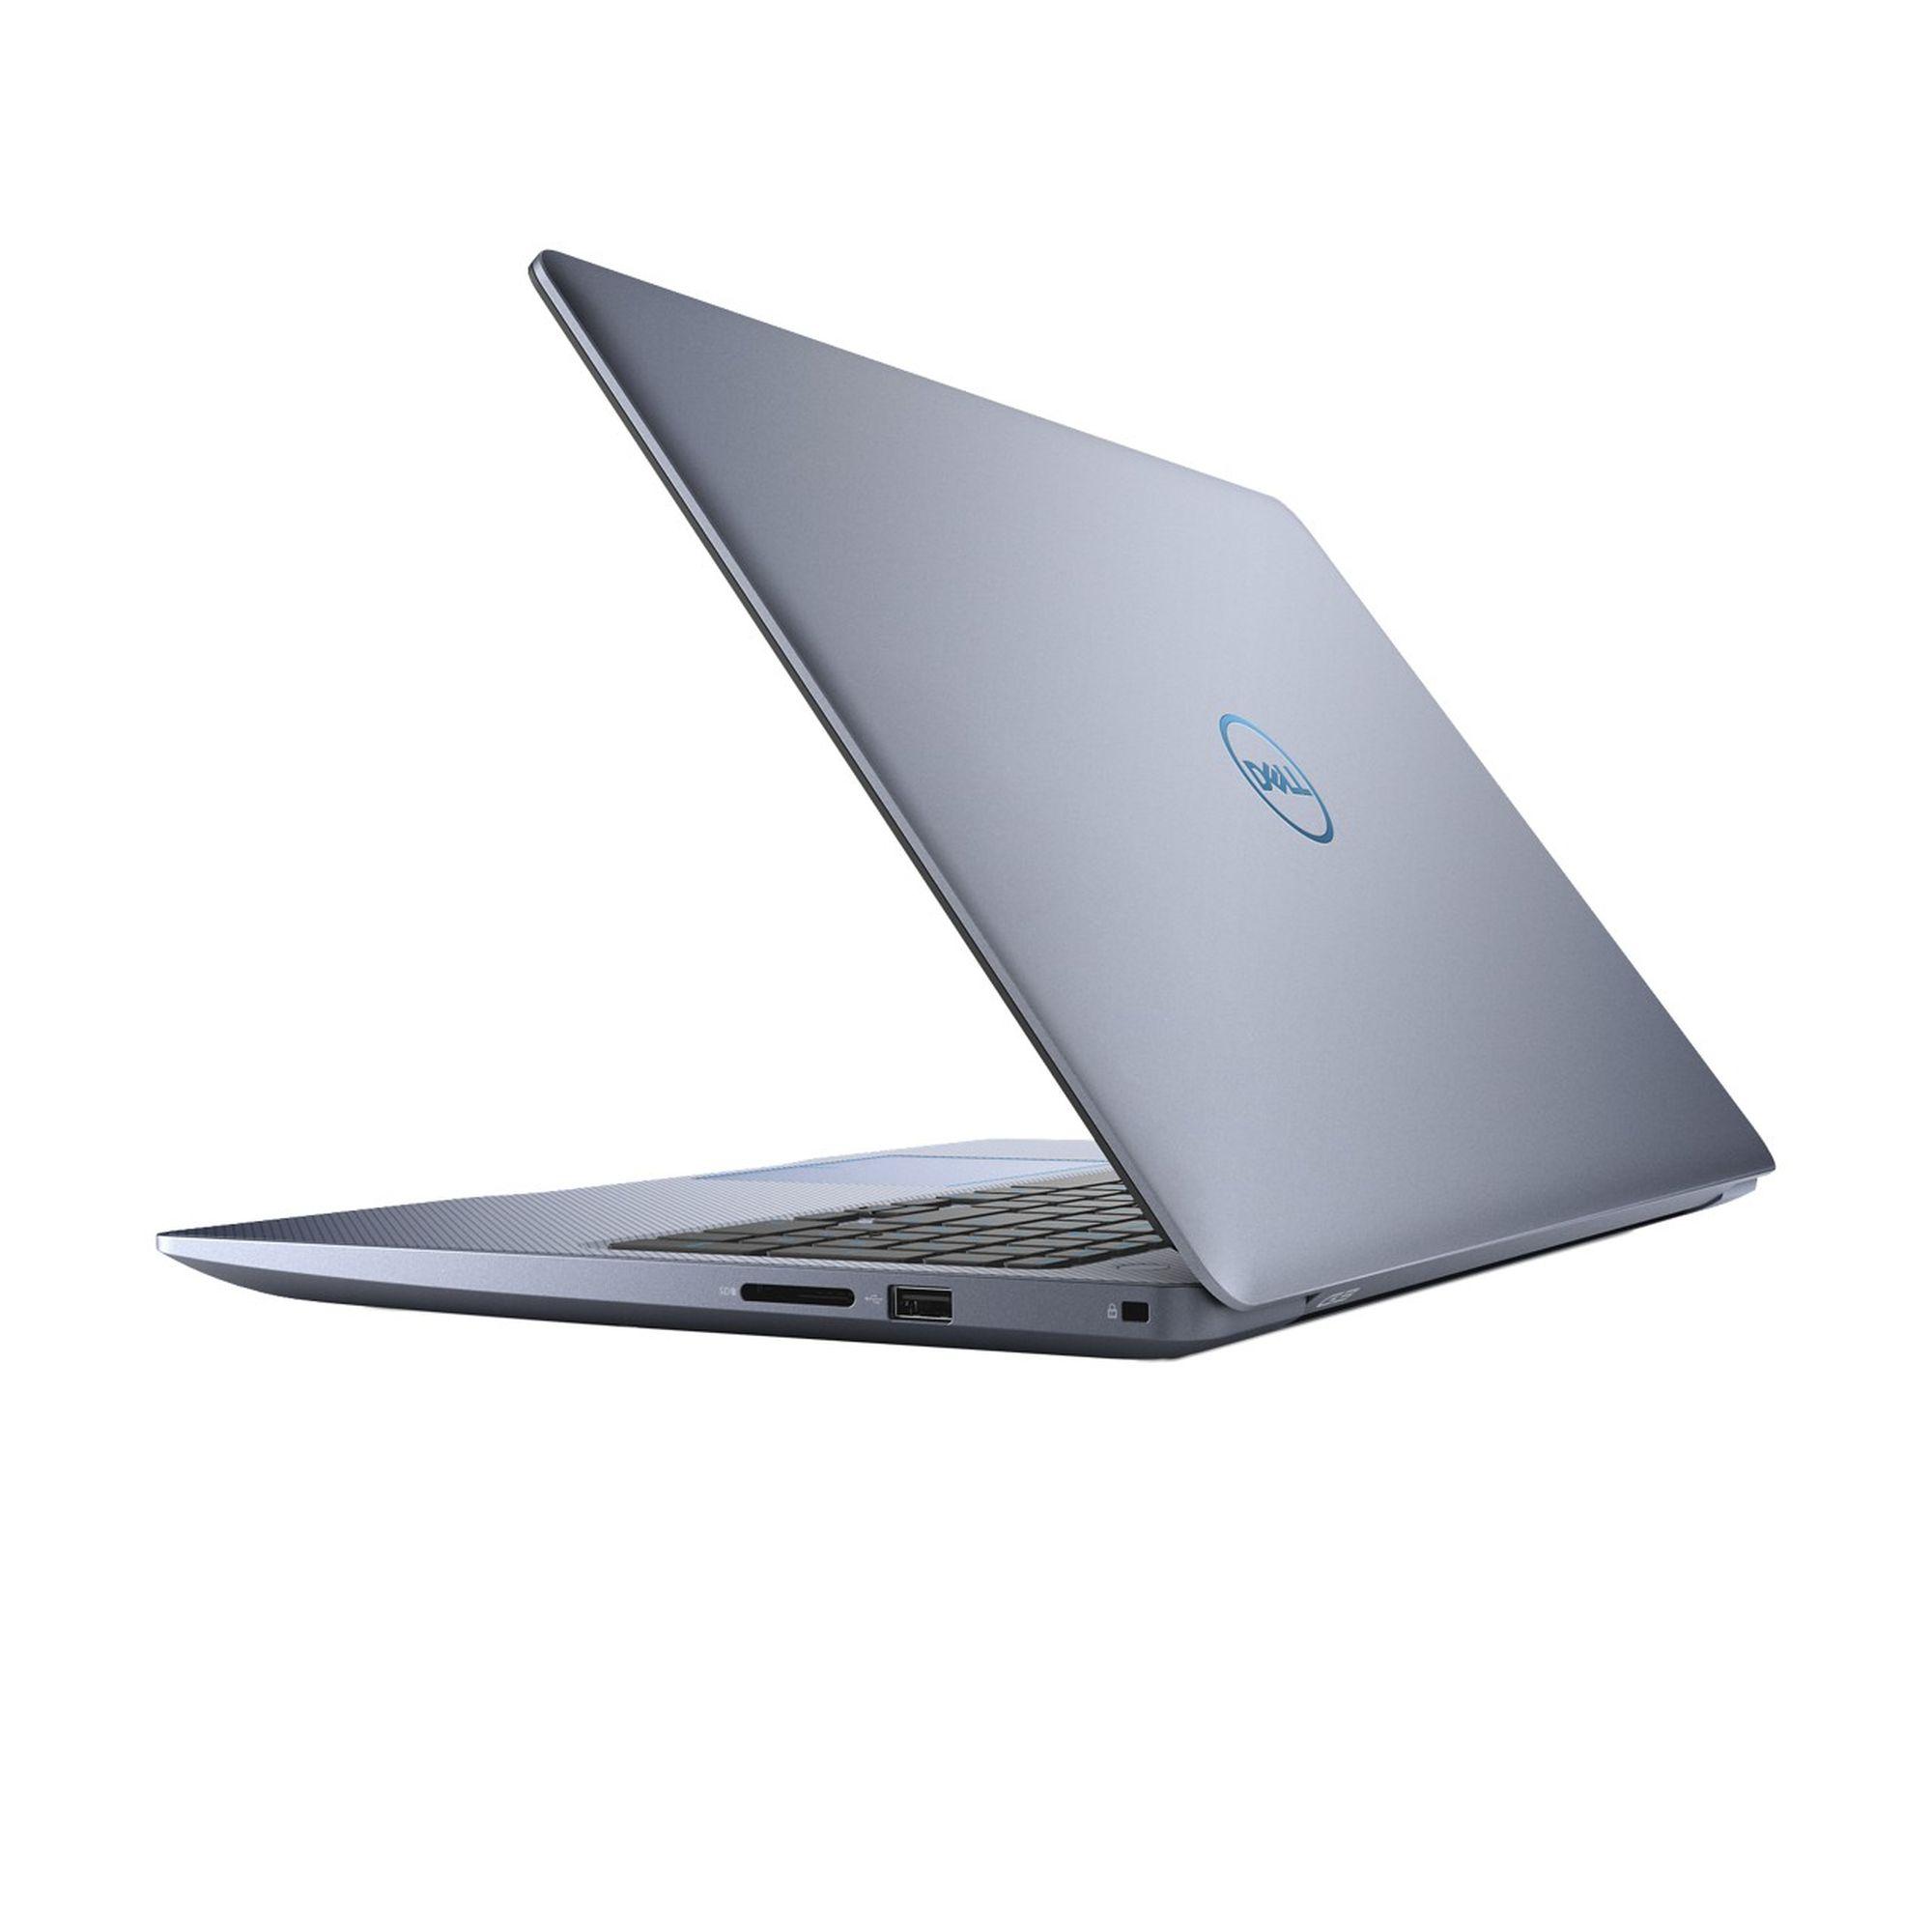 "DELL G3 15(3579)/i7-8750H/16GB/512GB SSD/15,6""/FHD/4GB Nvidia 1050Ti/Win10 64bit/modrý"